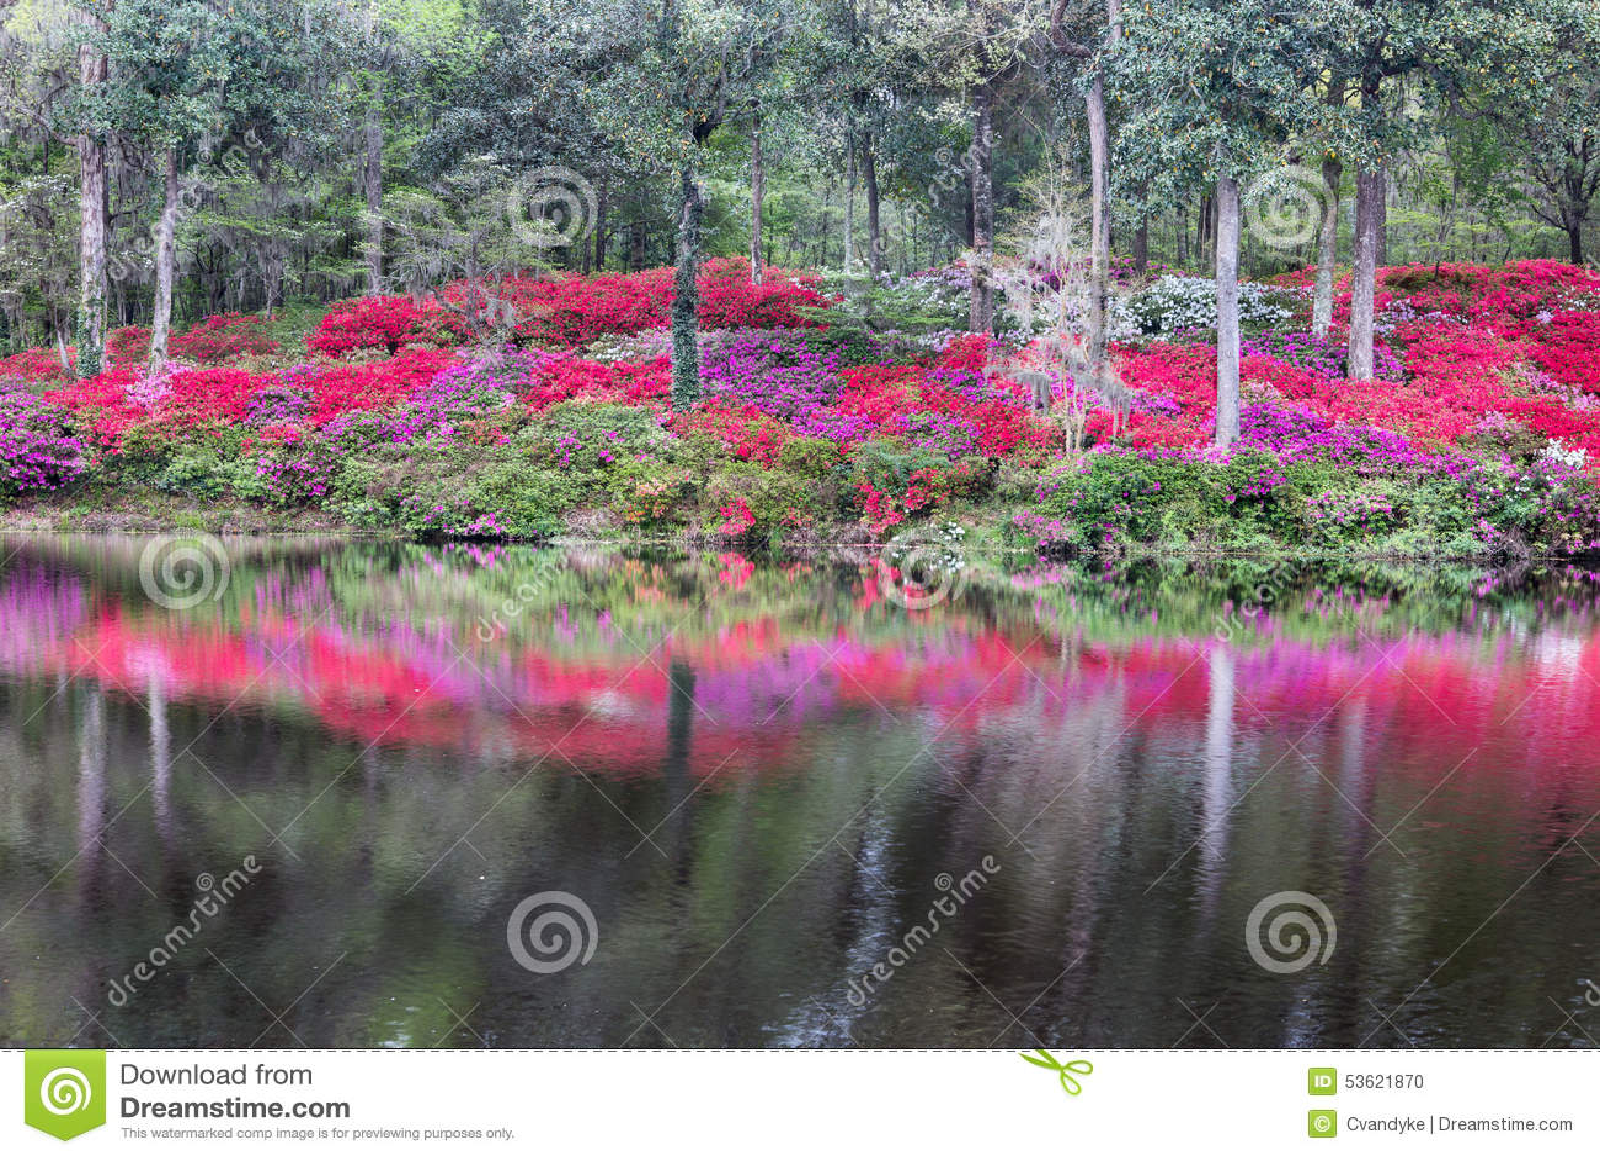 Outdoor Hillside Azalea Garden Water Reflection SC